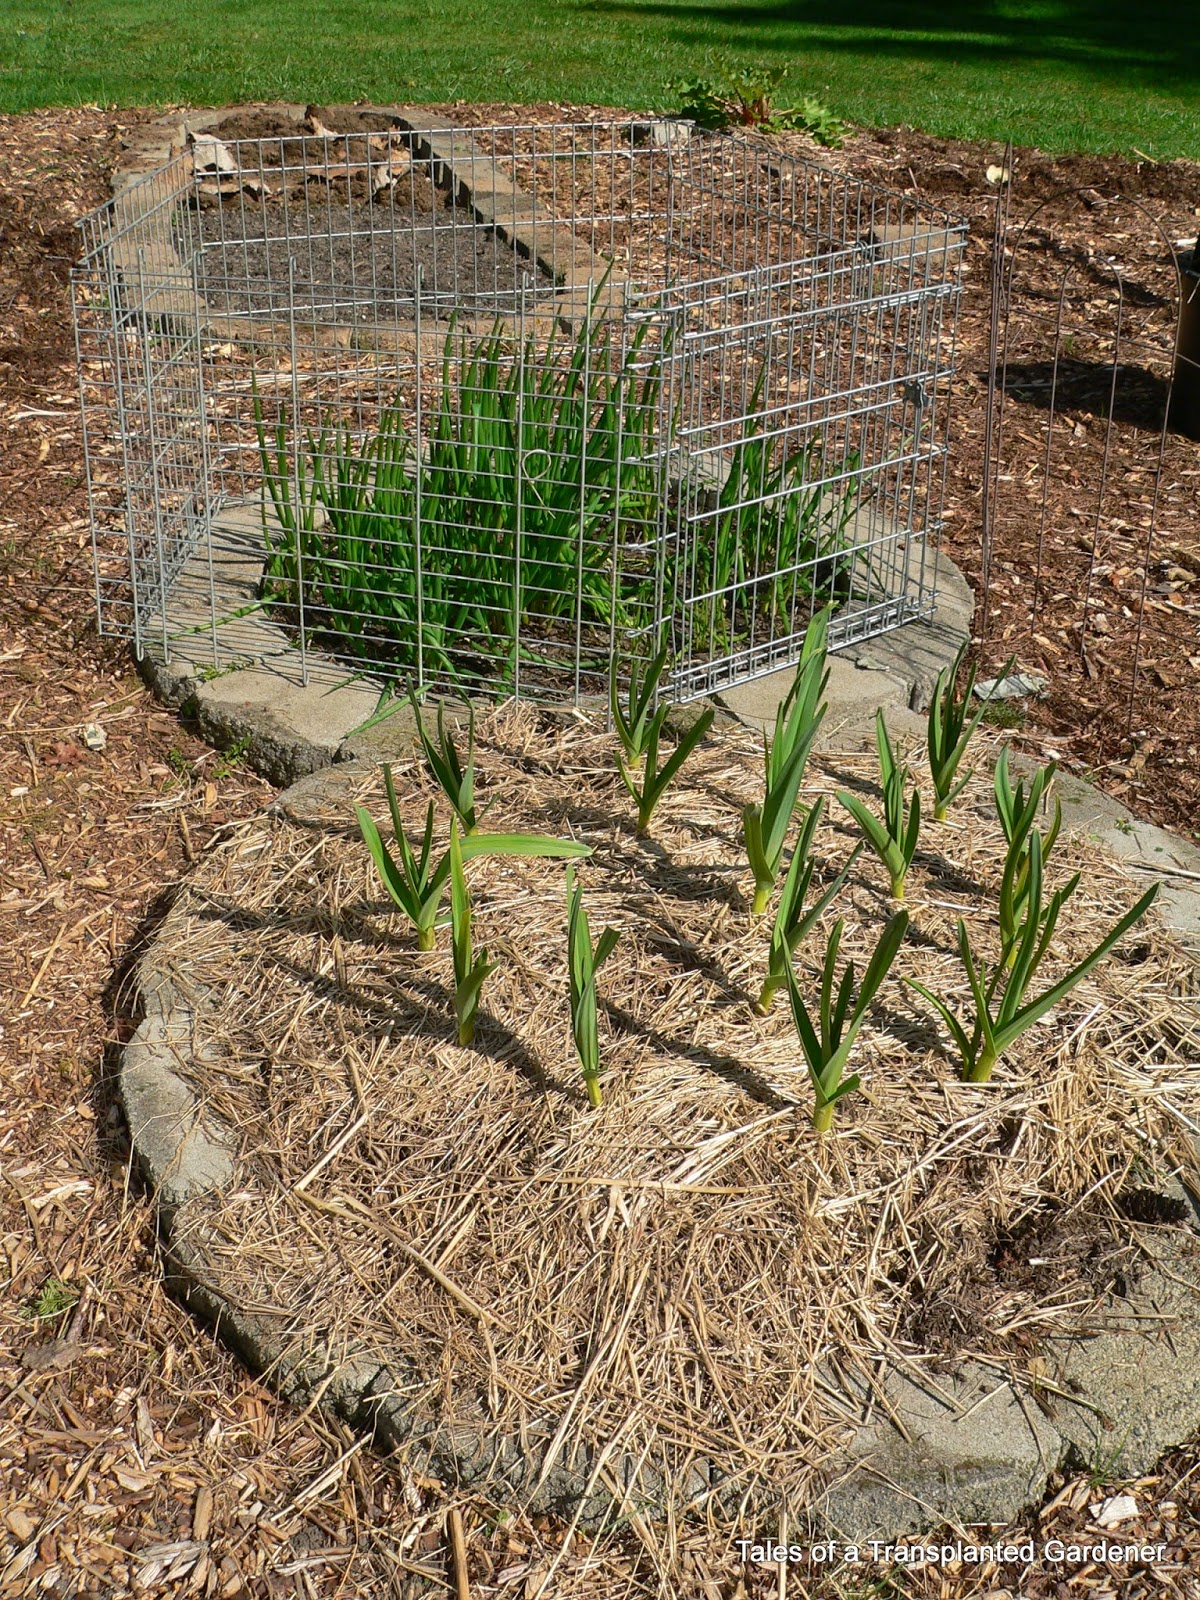 Tales of a Transplanted Gardener